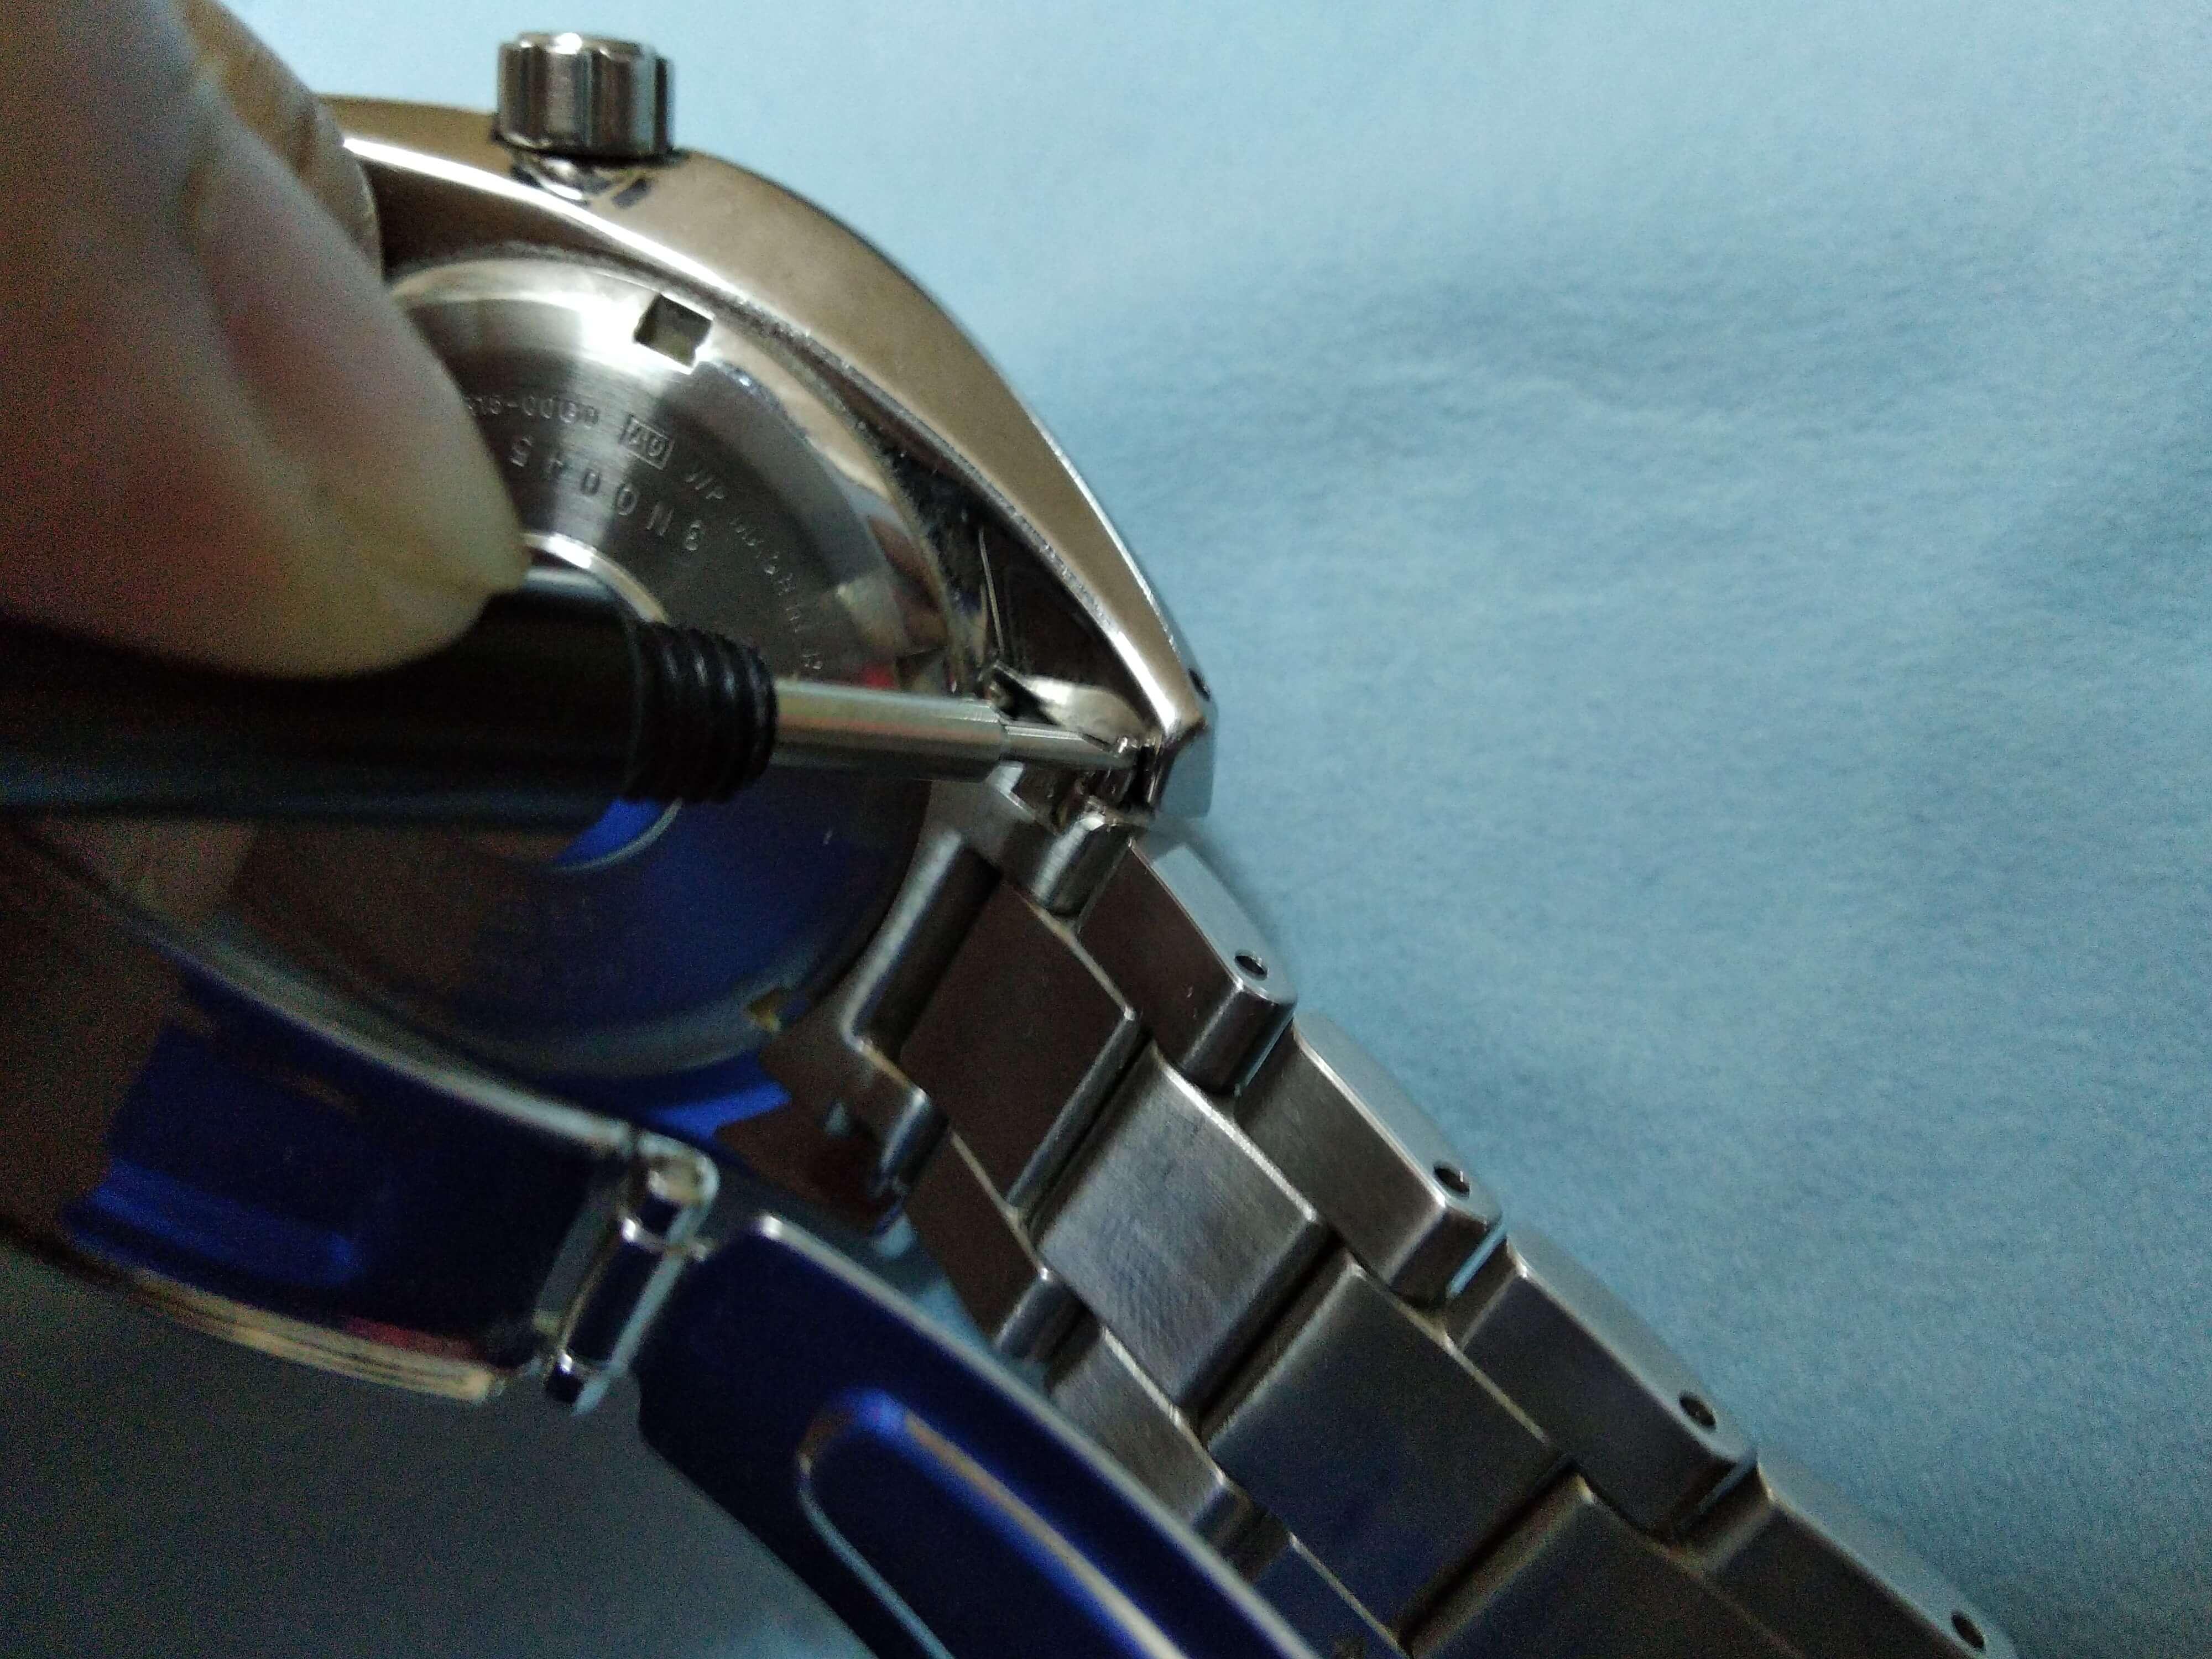 Seiko Bracelet Removal 1.1